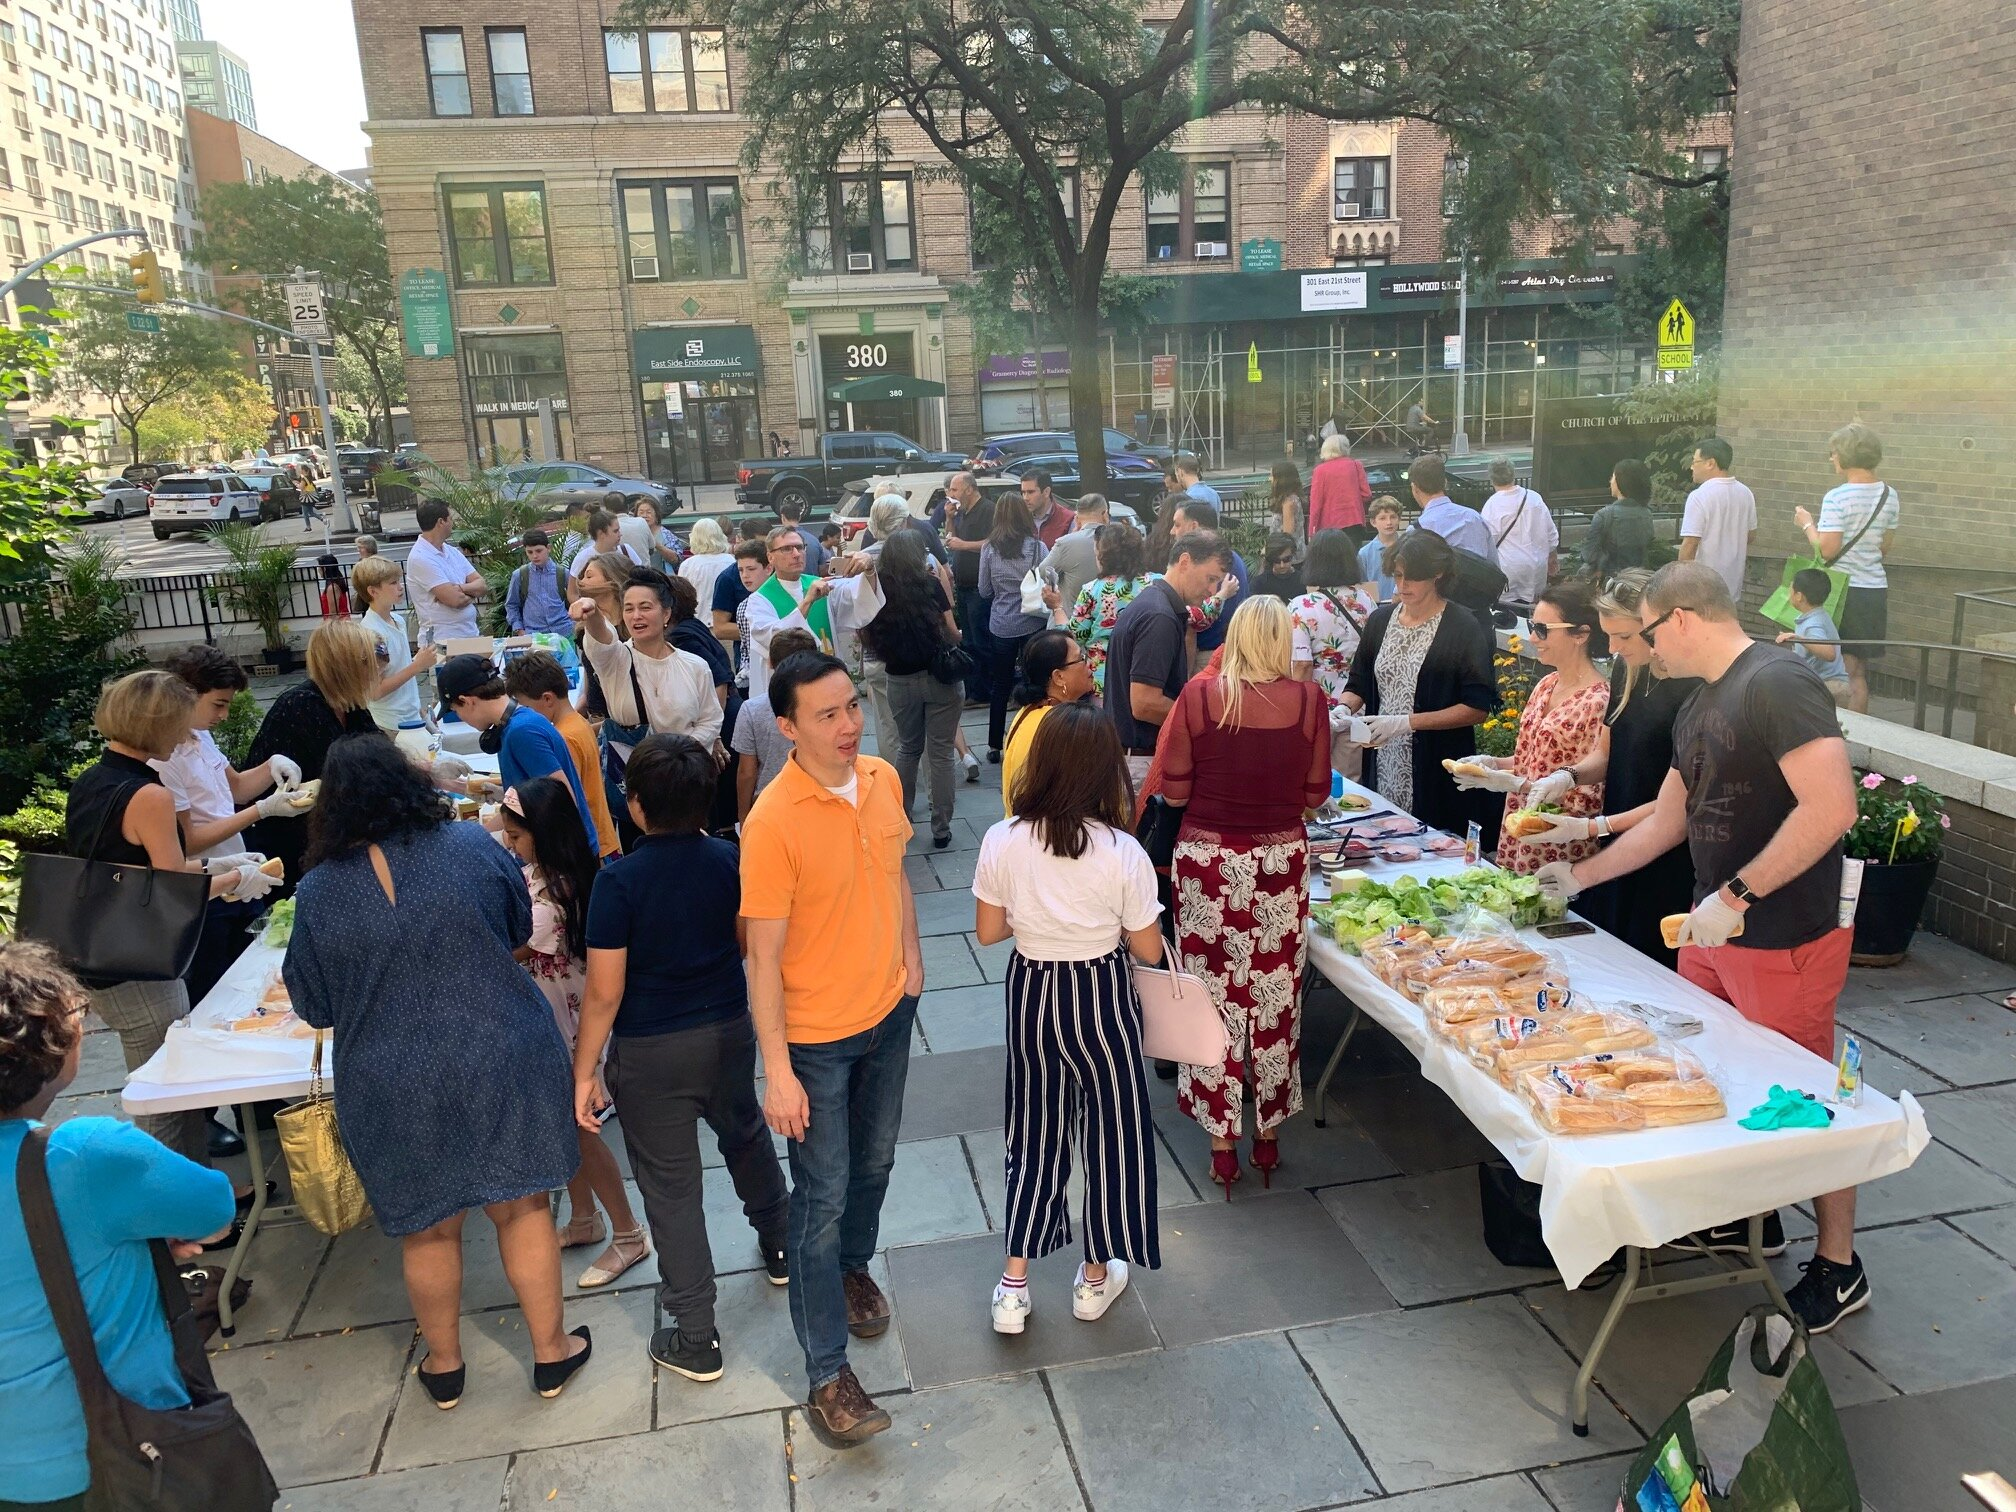 sandwichmaking on the plaza 2 sept 22 2019.jpg